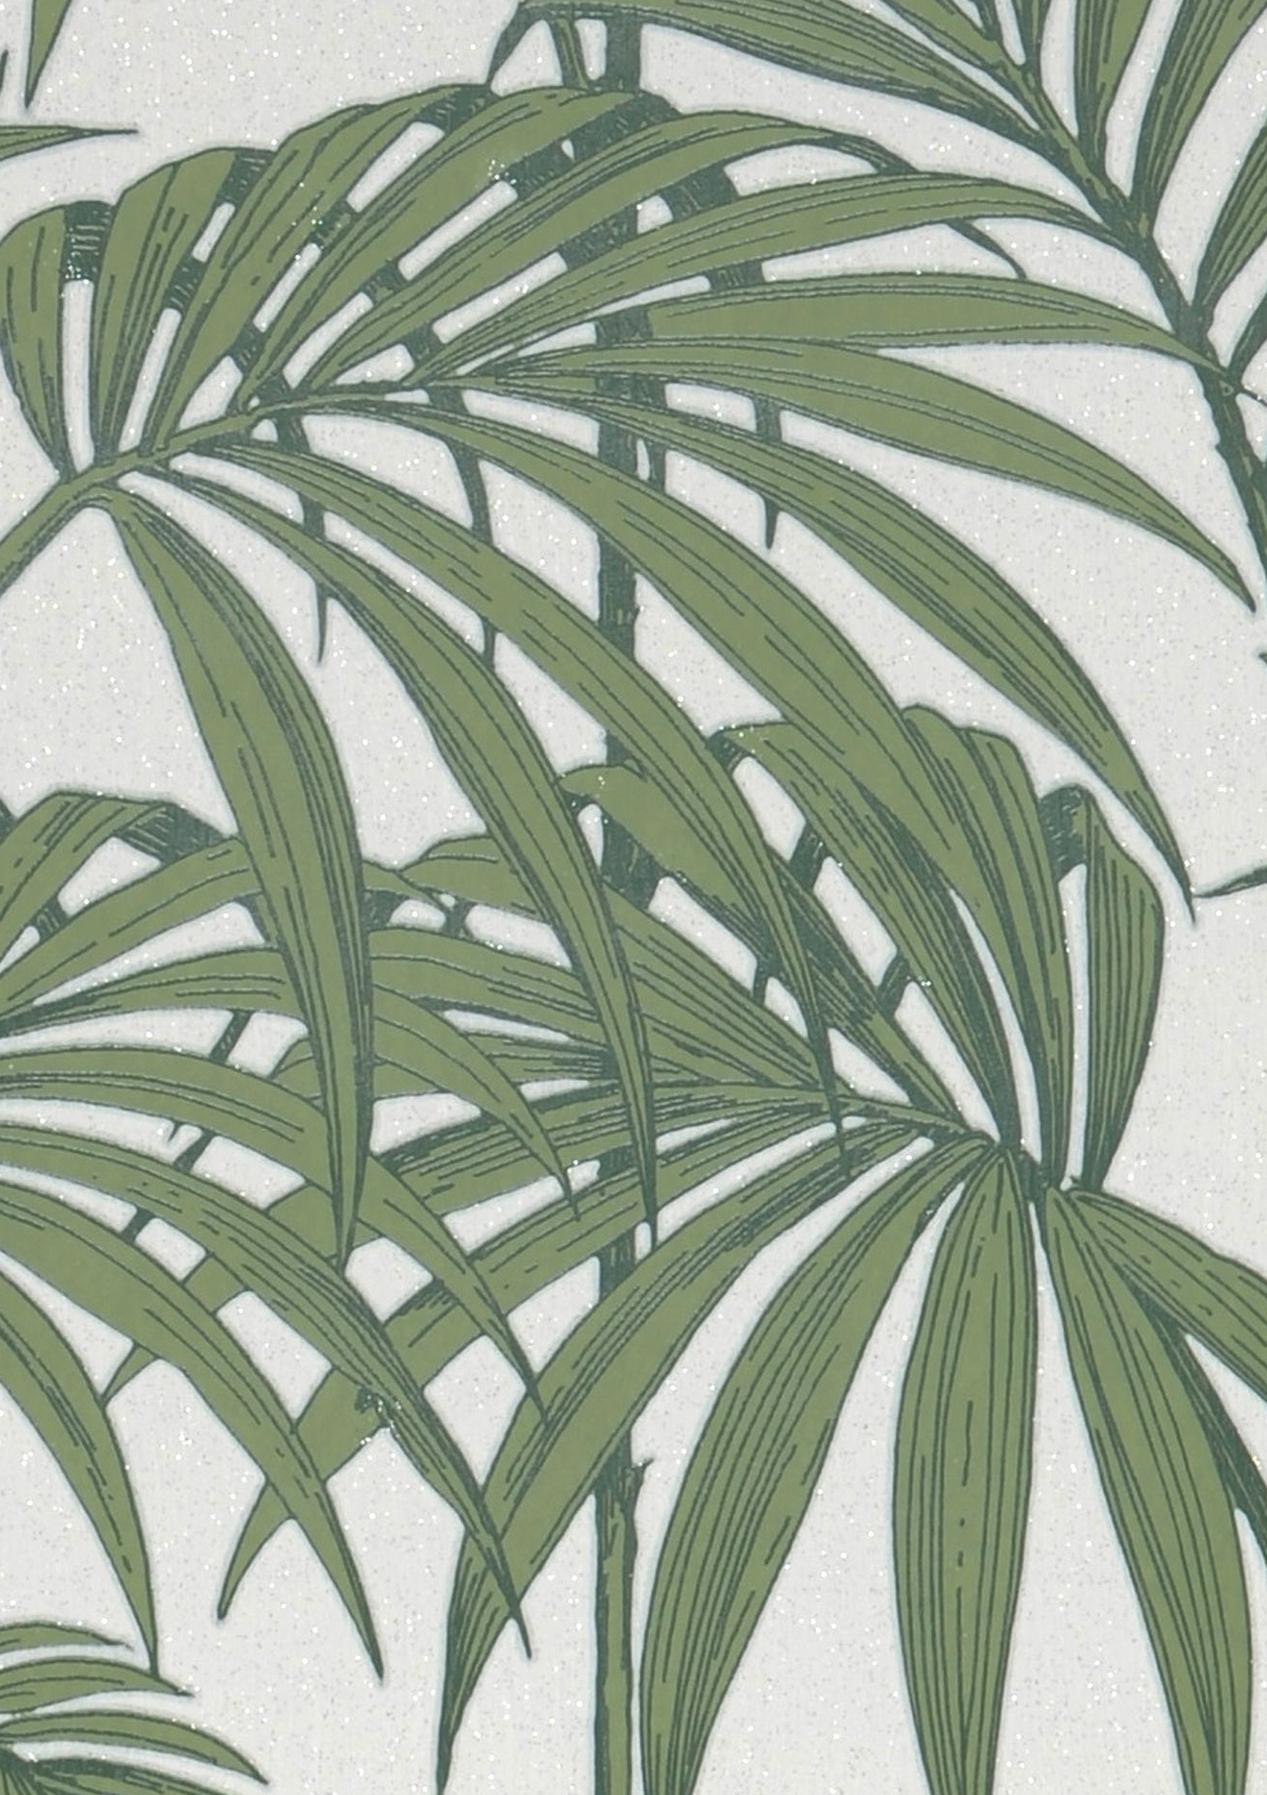 tapete tatanu weiss glitzer dunkelgr n pastellgr n. Black Bedroom Furniture Sets. Home Design Ideas